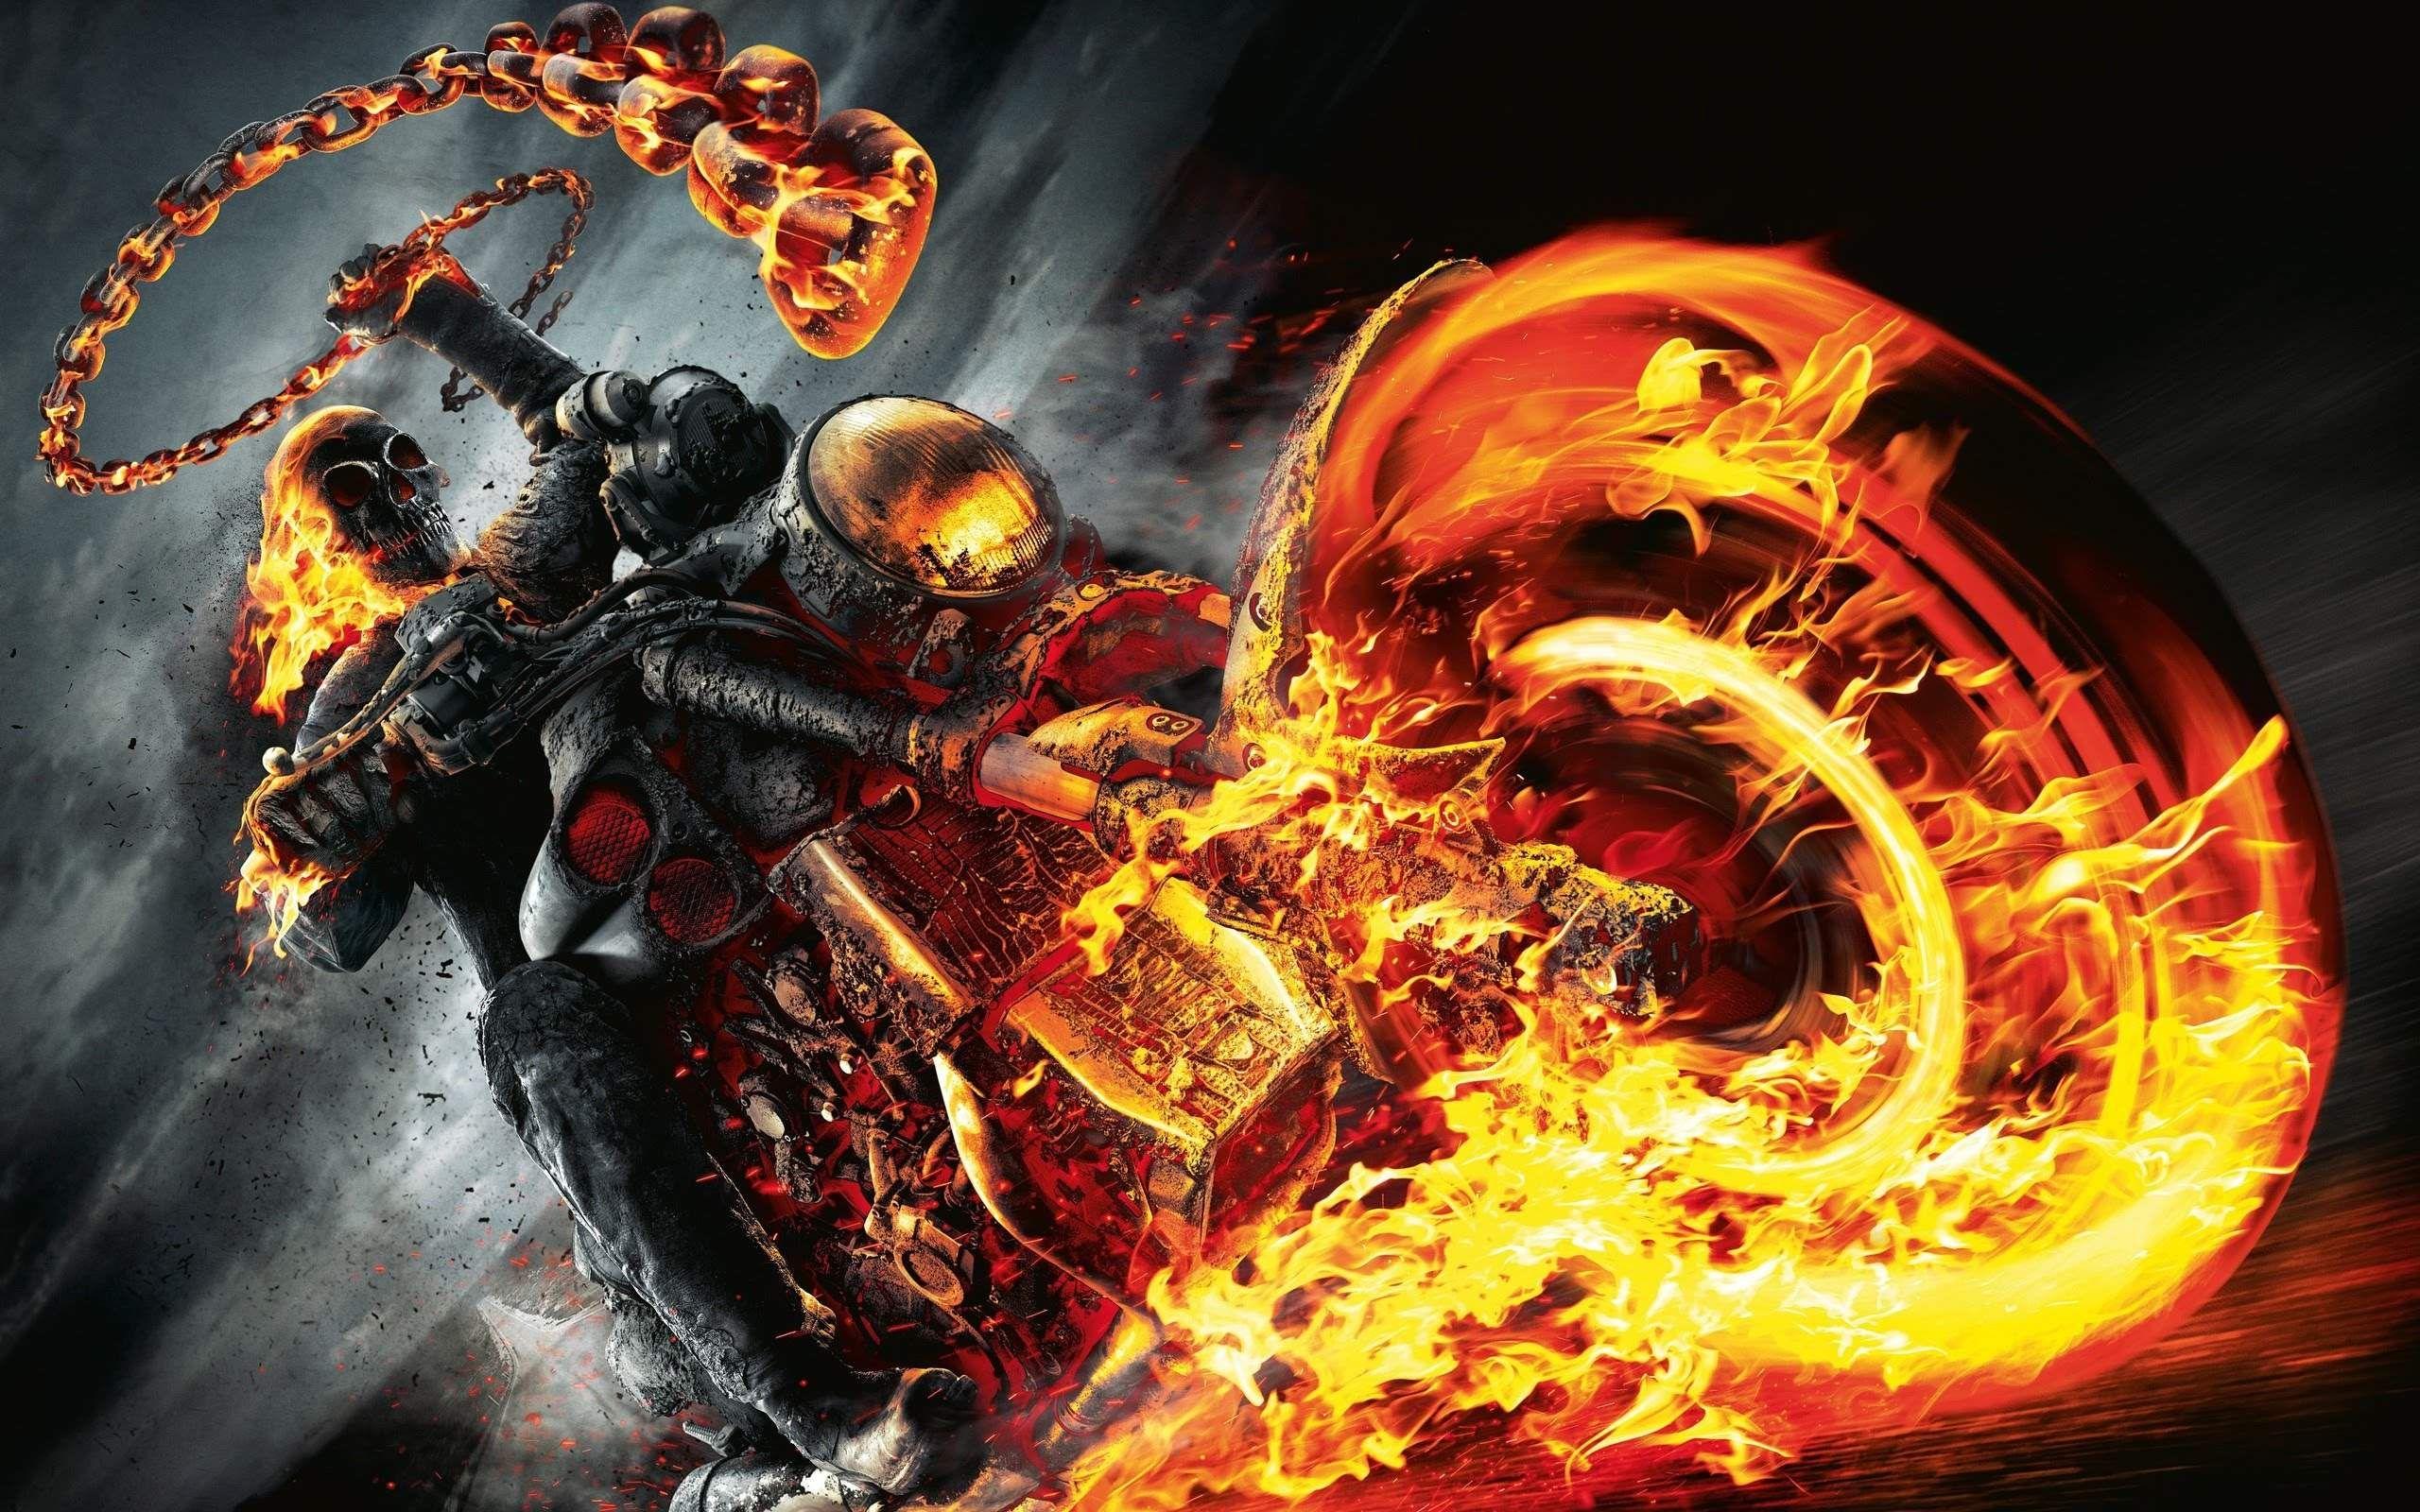 Ghost Rider Bike Wallpaper HD Download For Desktop And Mobile